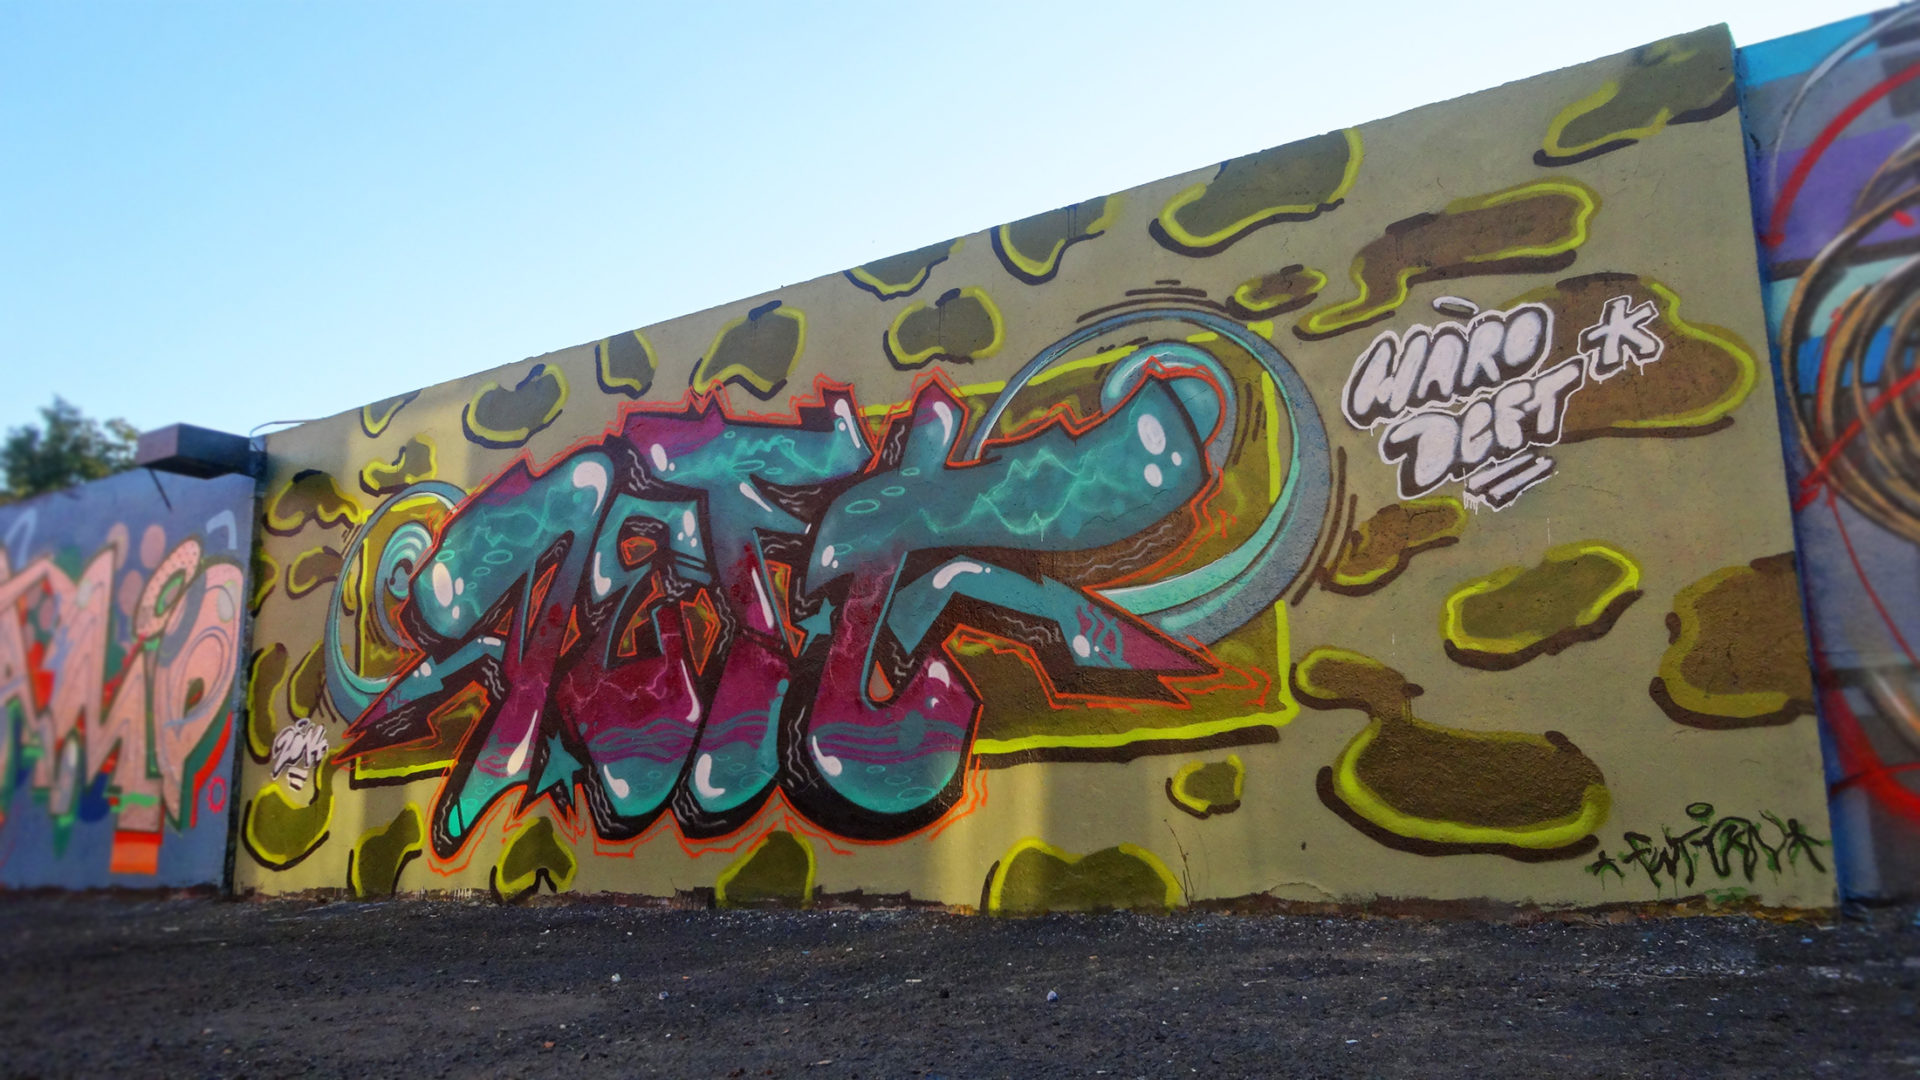 deft_graffiti_fresstyle_2